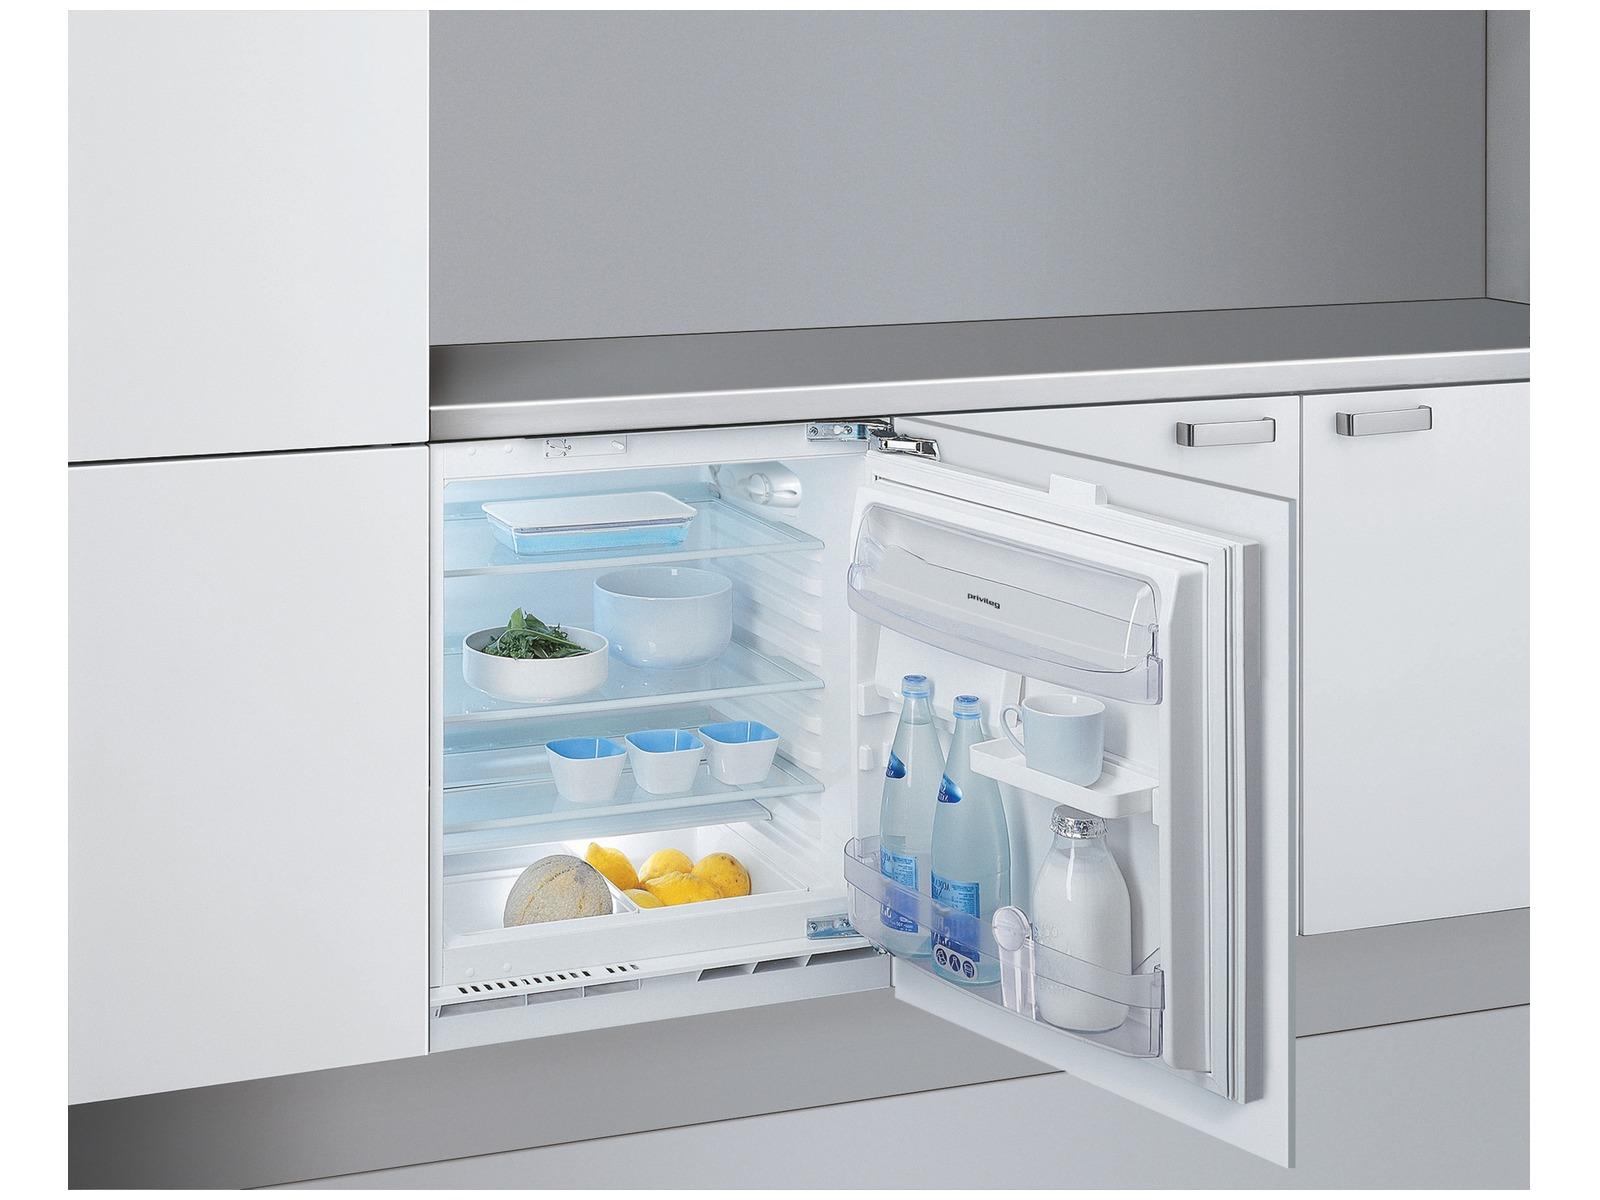 Kühlschrank Weiss : Bomann minikühlschrank kb technik elektro großgeräte